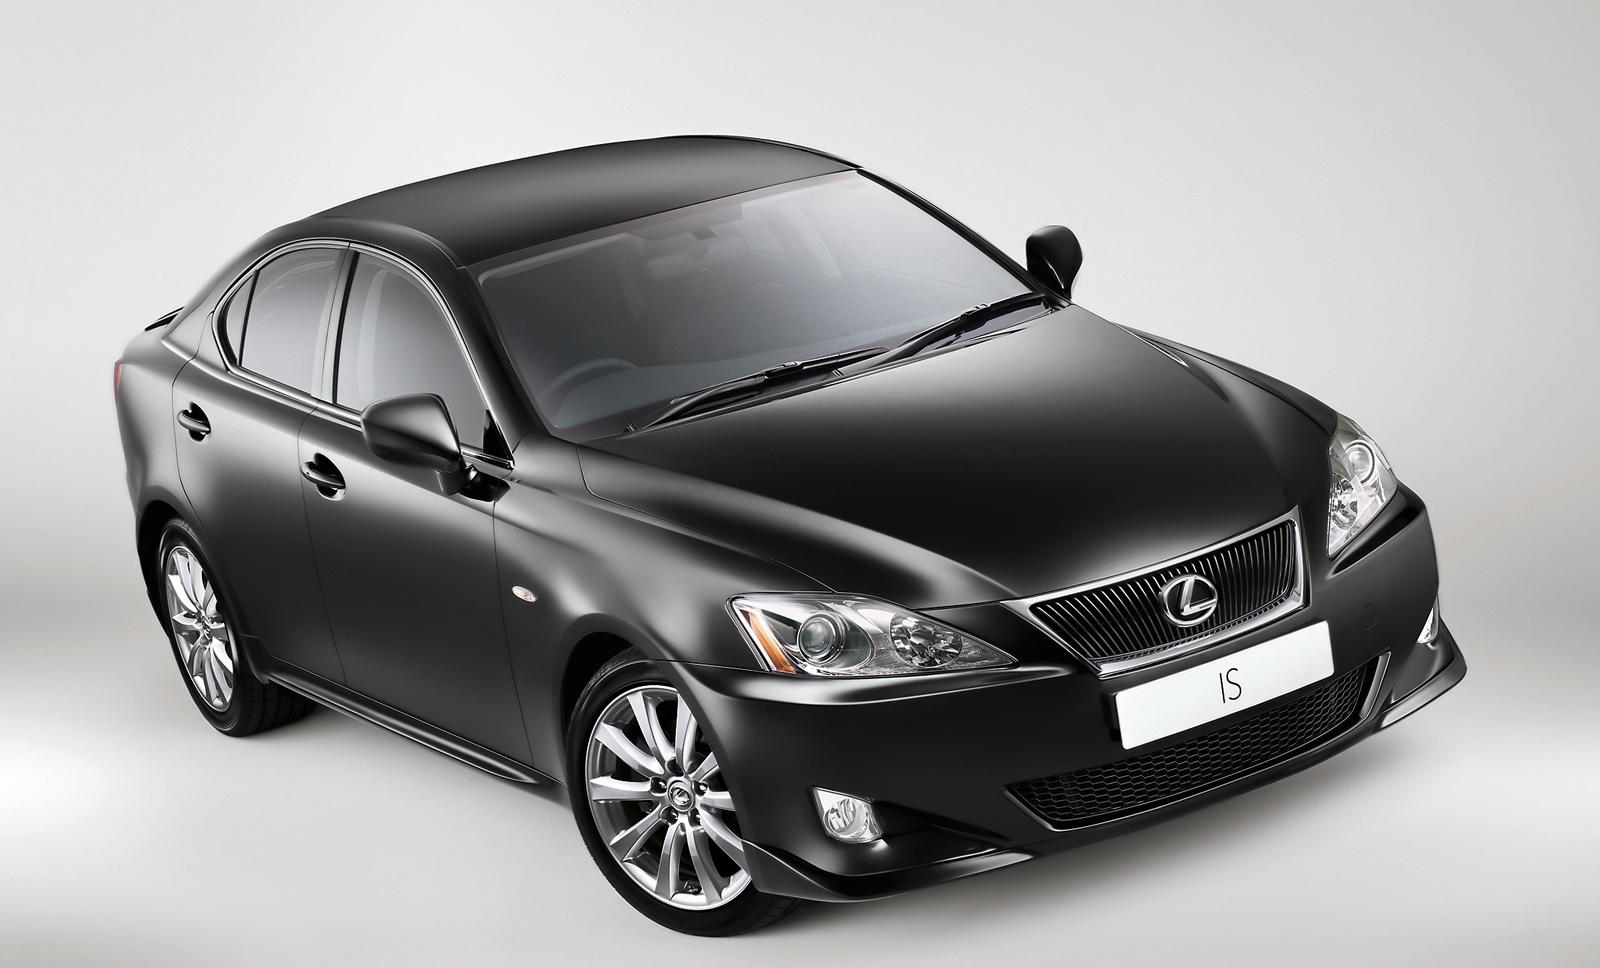 2007 Lexus Is 250 Wiring Diagram Schematics Diagrams Is250 Factory Workshop Service Repair Manua Rh Sellfy Com 1998 Lx470